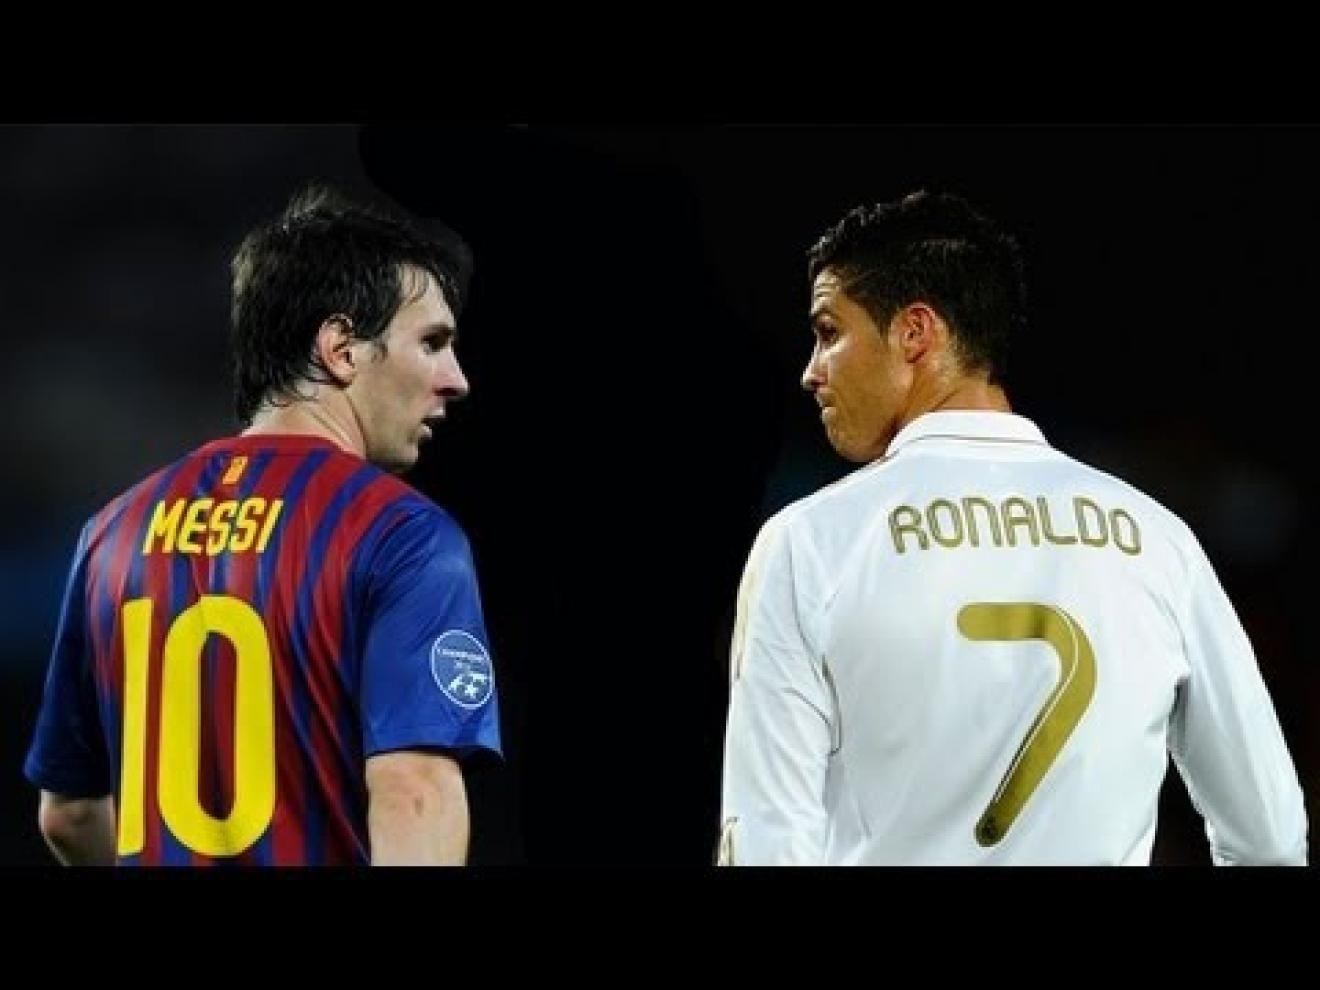 Ronaldo Will Surpass Messi Http Www Tsmplug Com Football